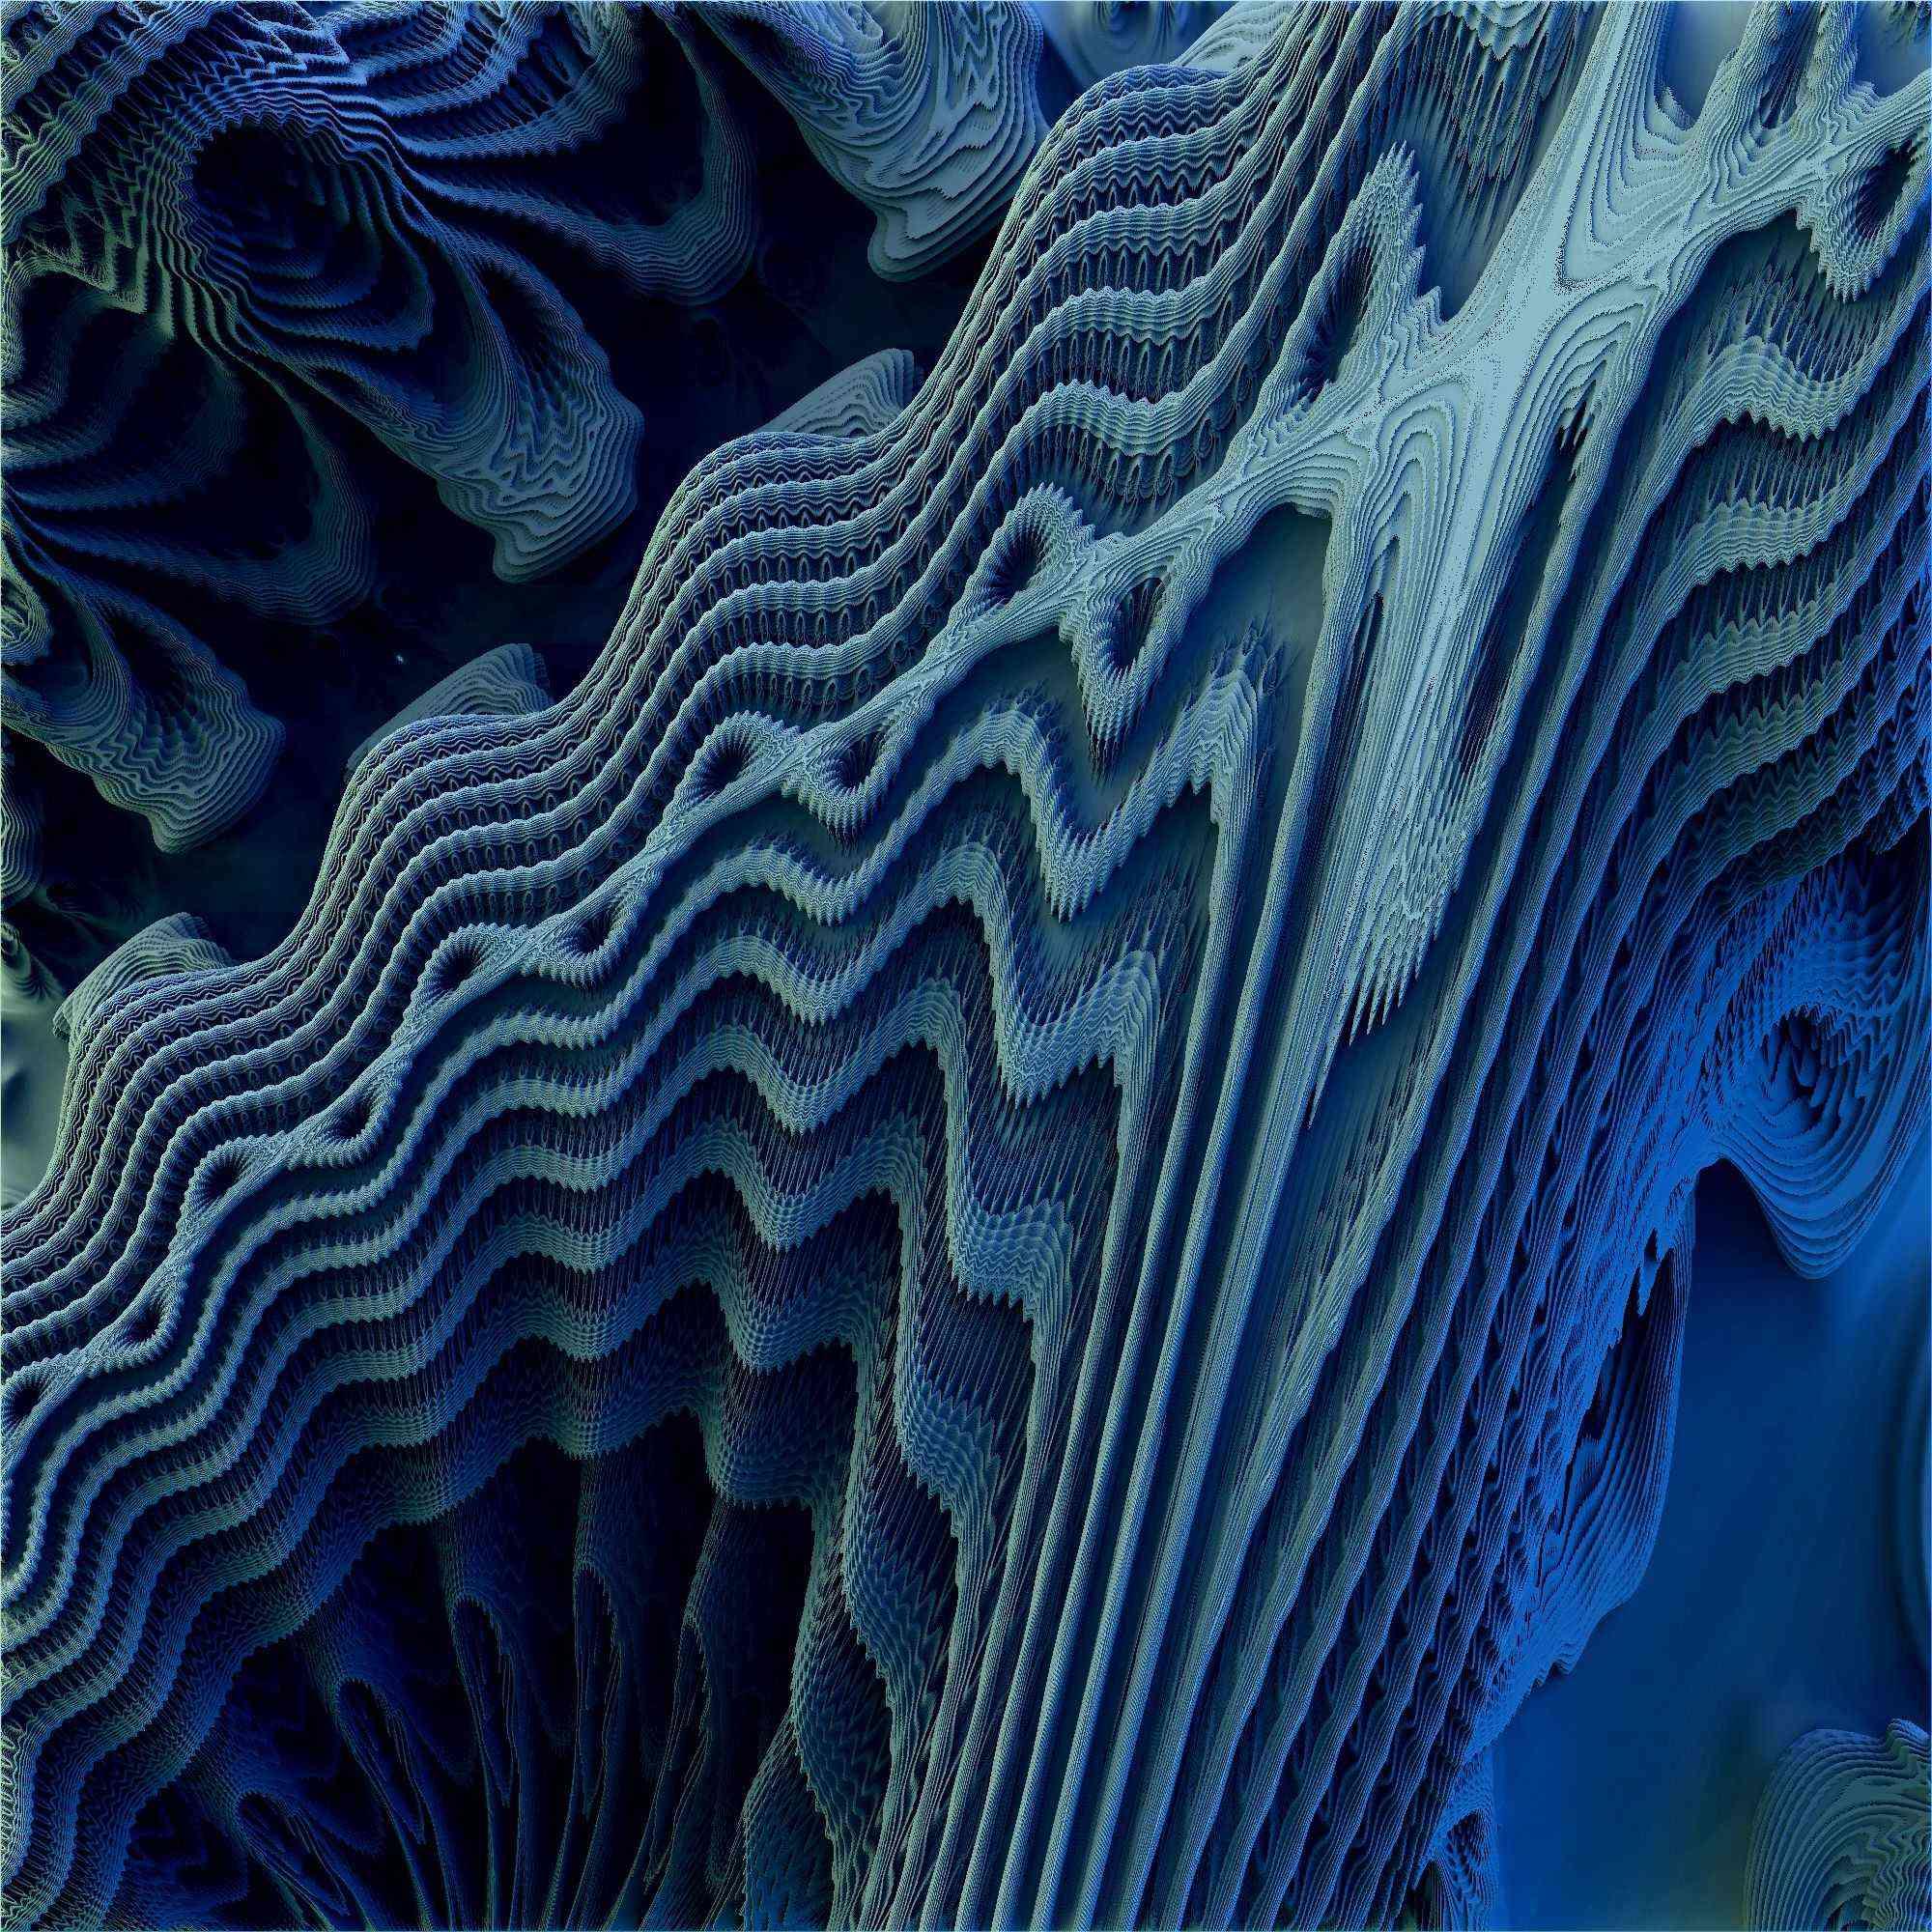 deepsalvage ii 3d fractal - photo #24